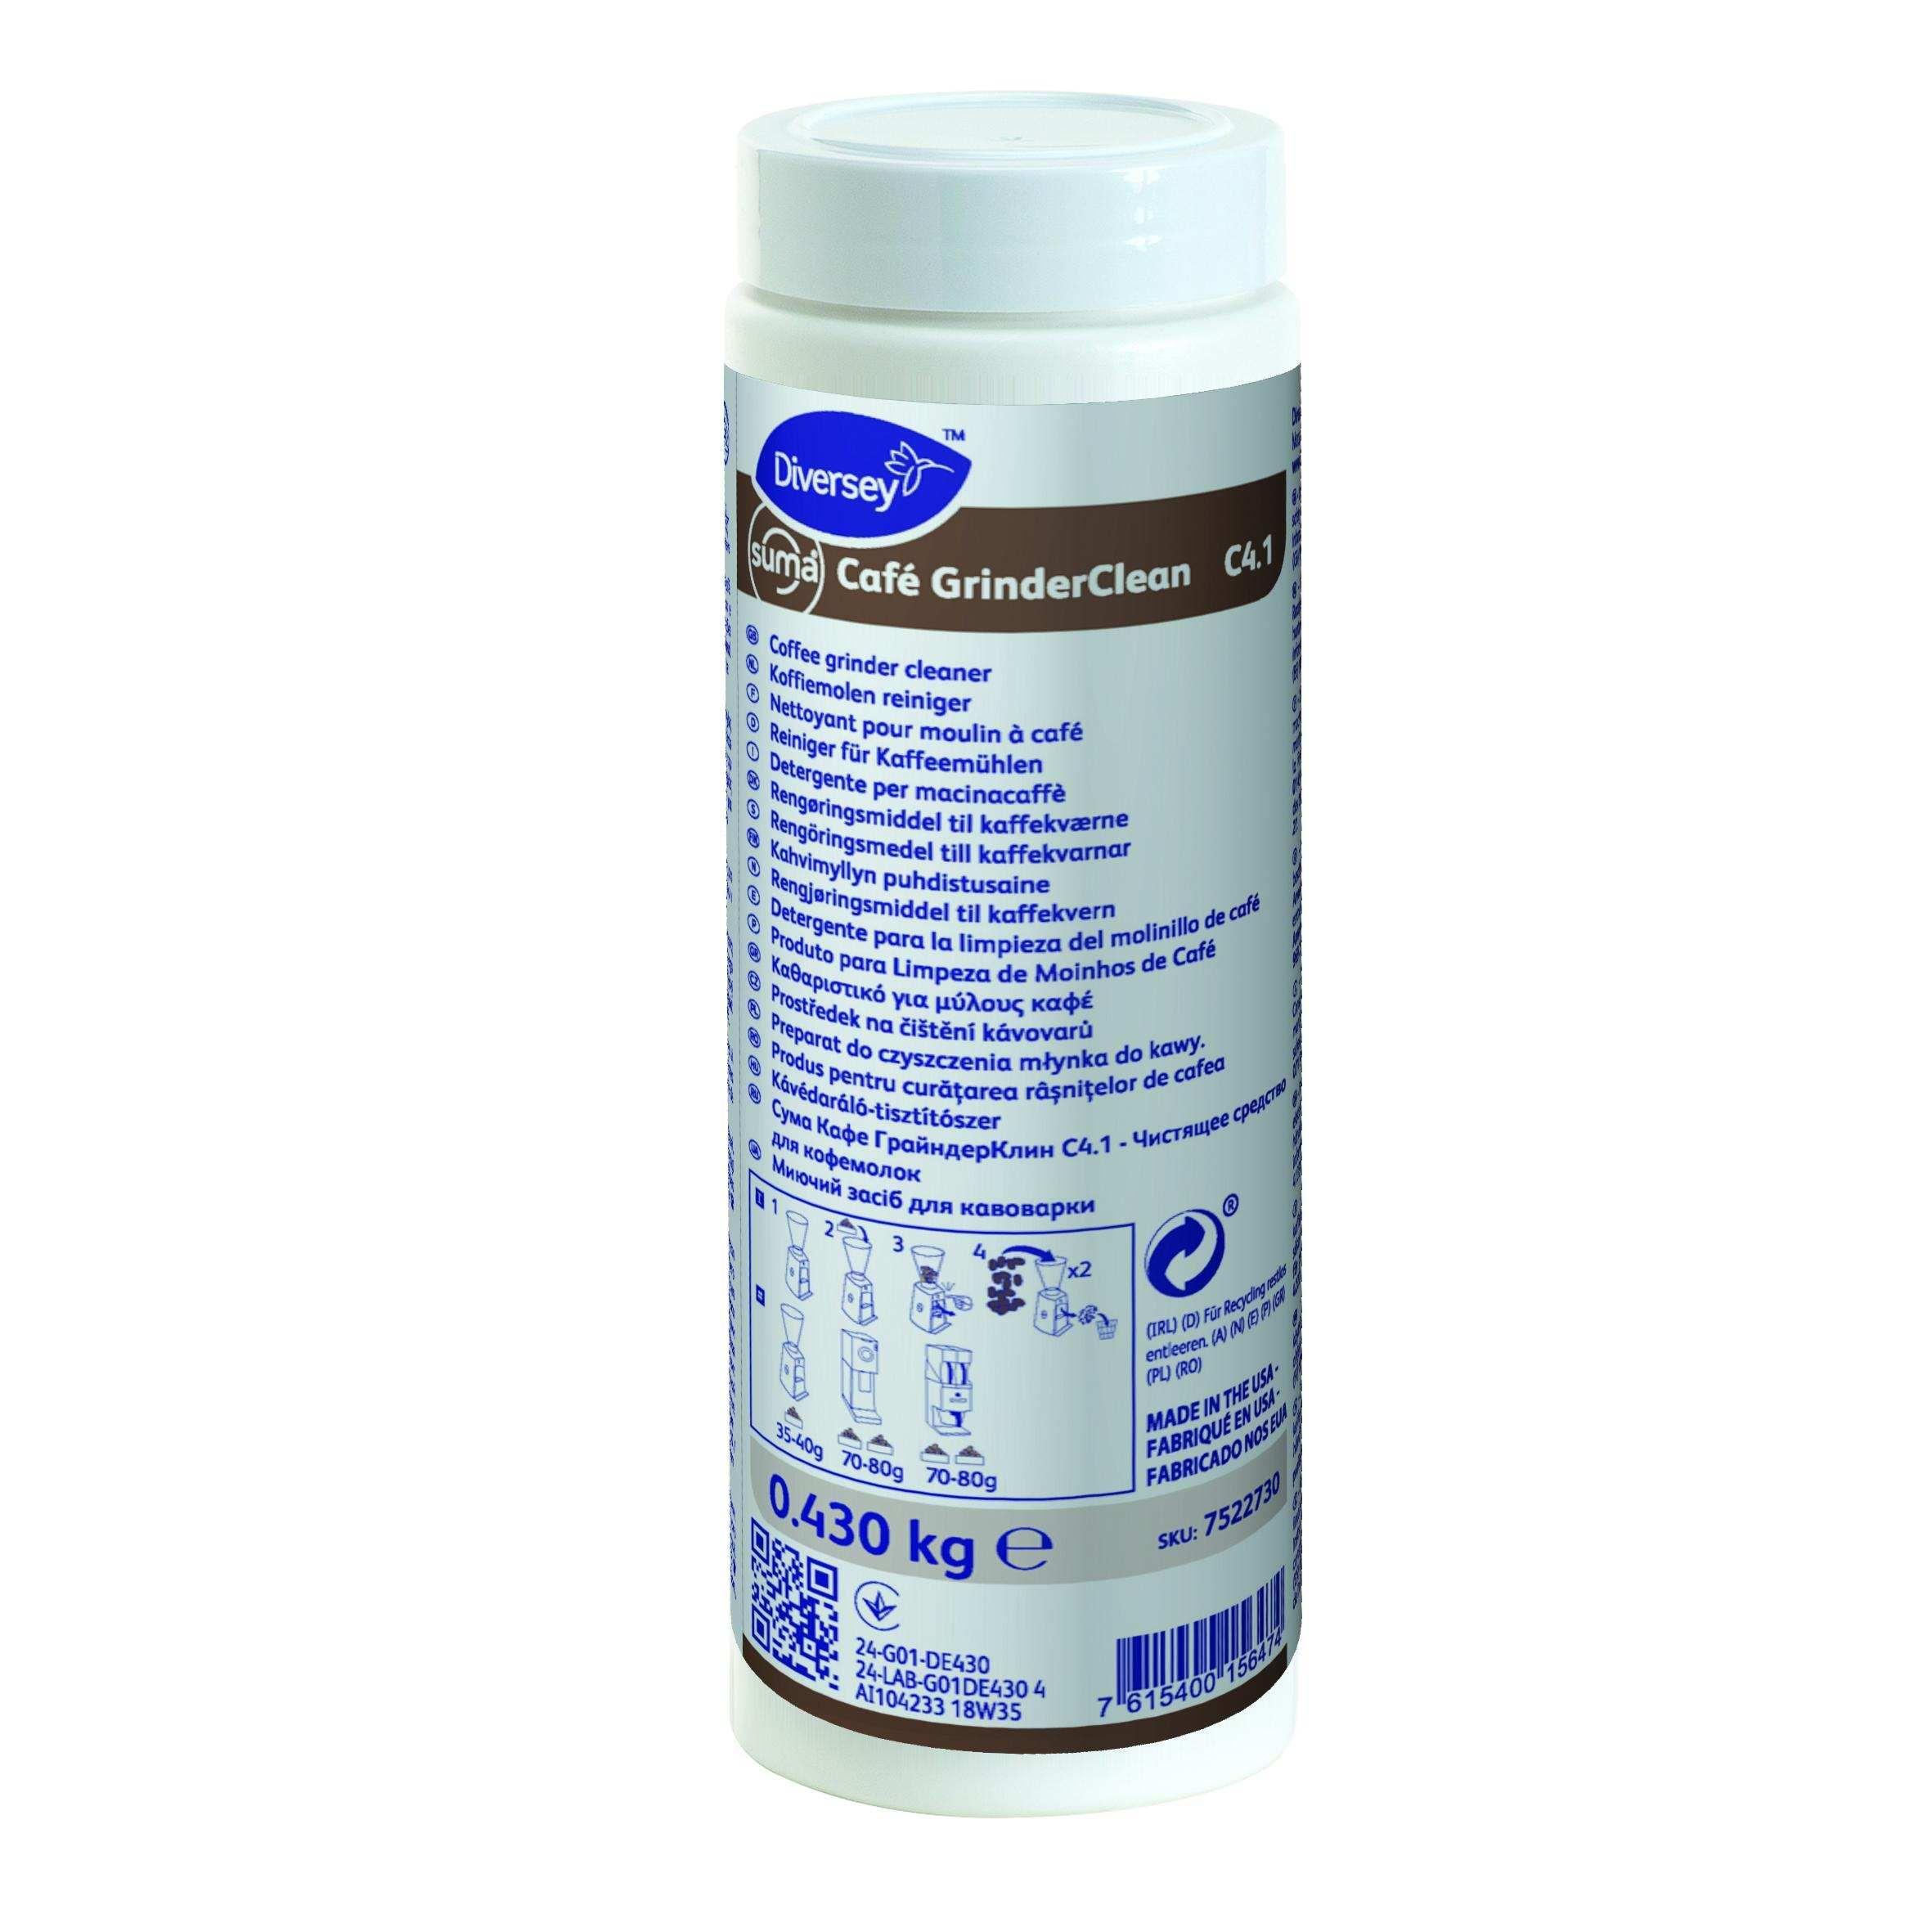 7522730-Suma-Cafe-Grinder-Clean-C4.1-0,430kg-CMYK-20x20cm.jpg